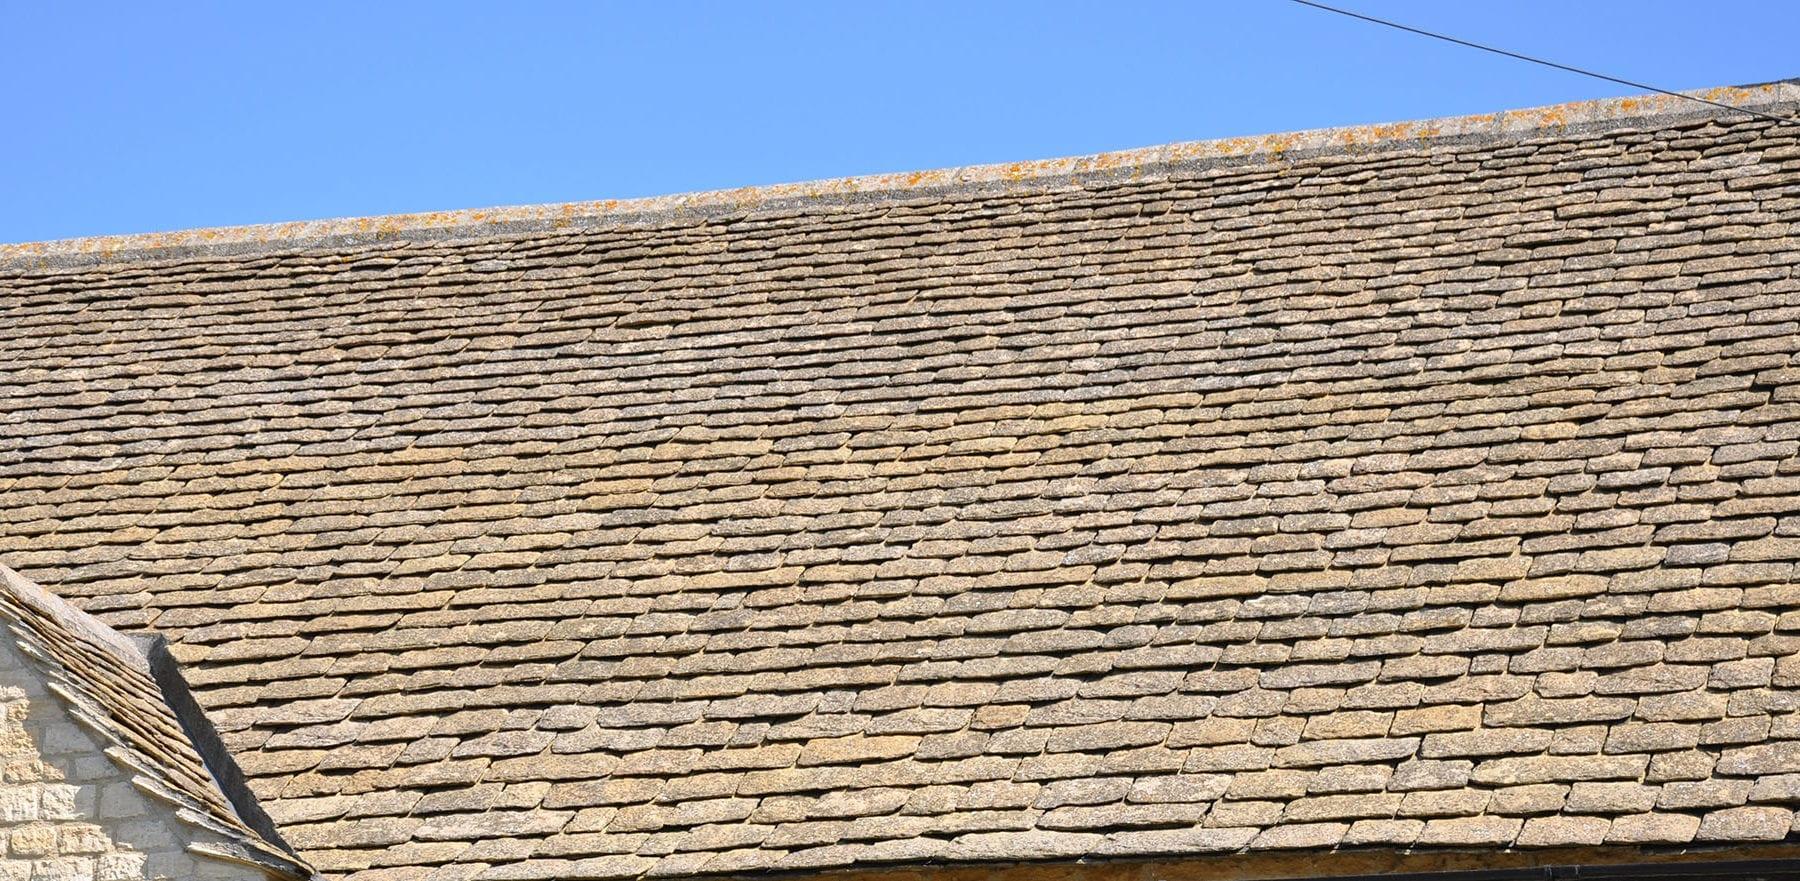 Lifestiles - Natural Stone Aged Roof Tiles - Oxford University, England 4